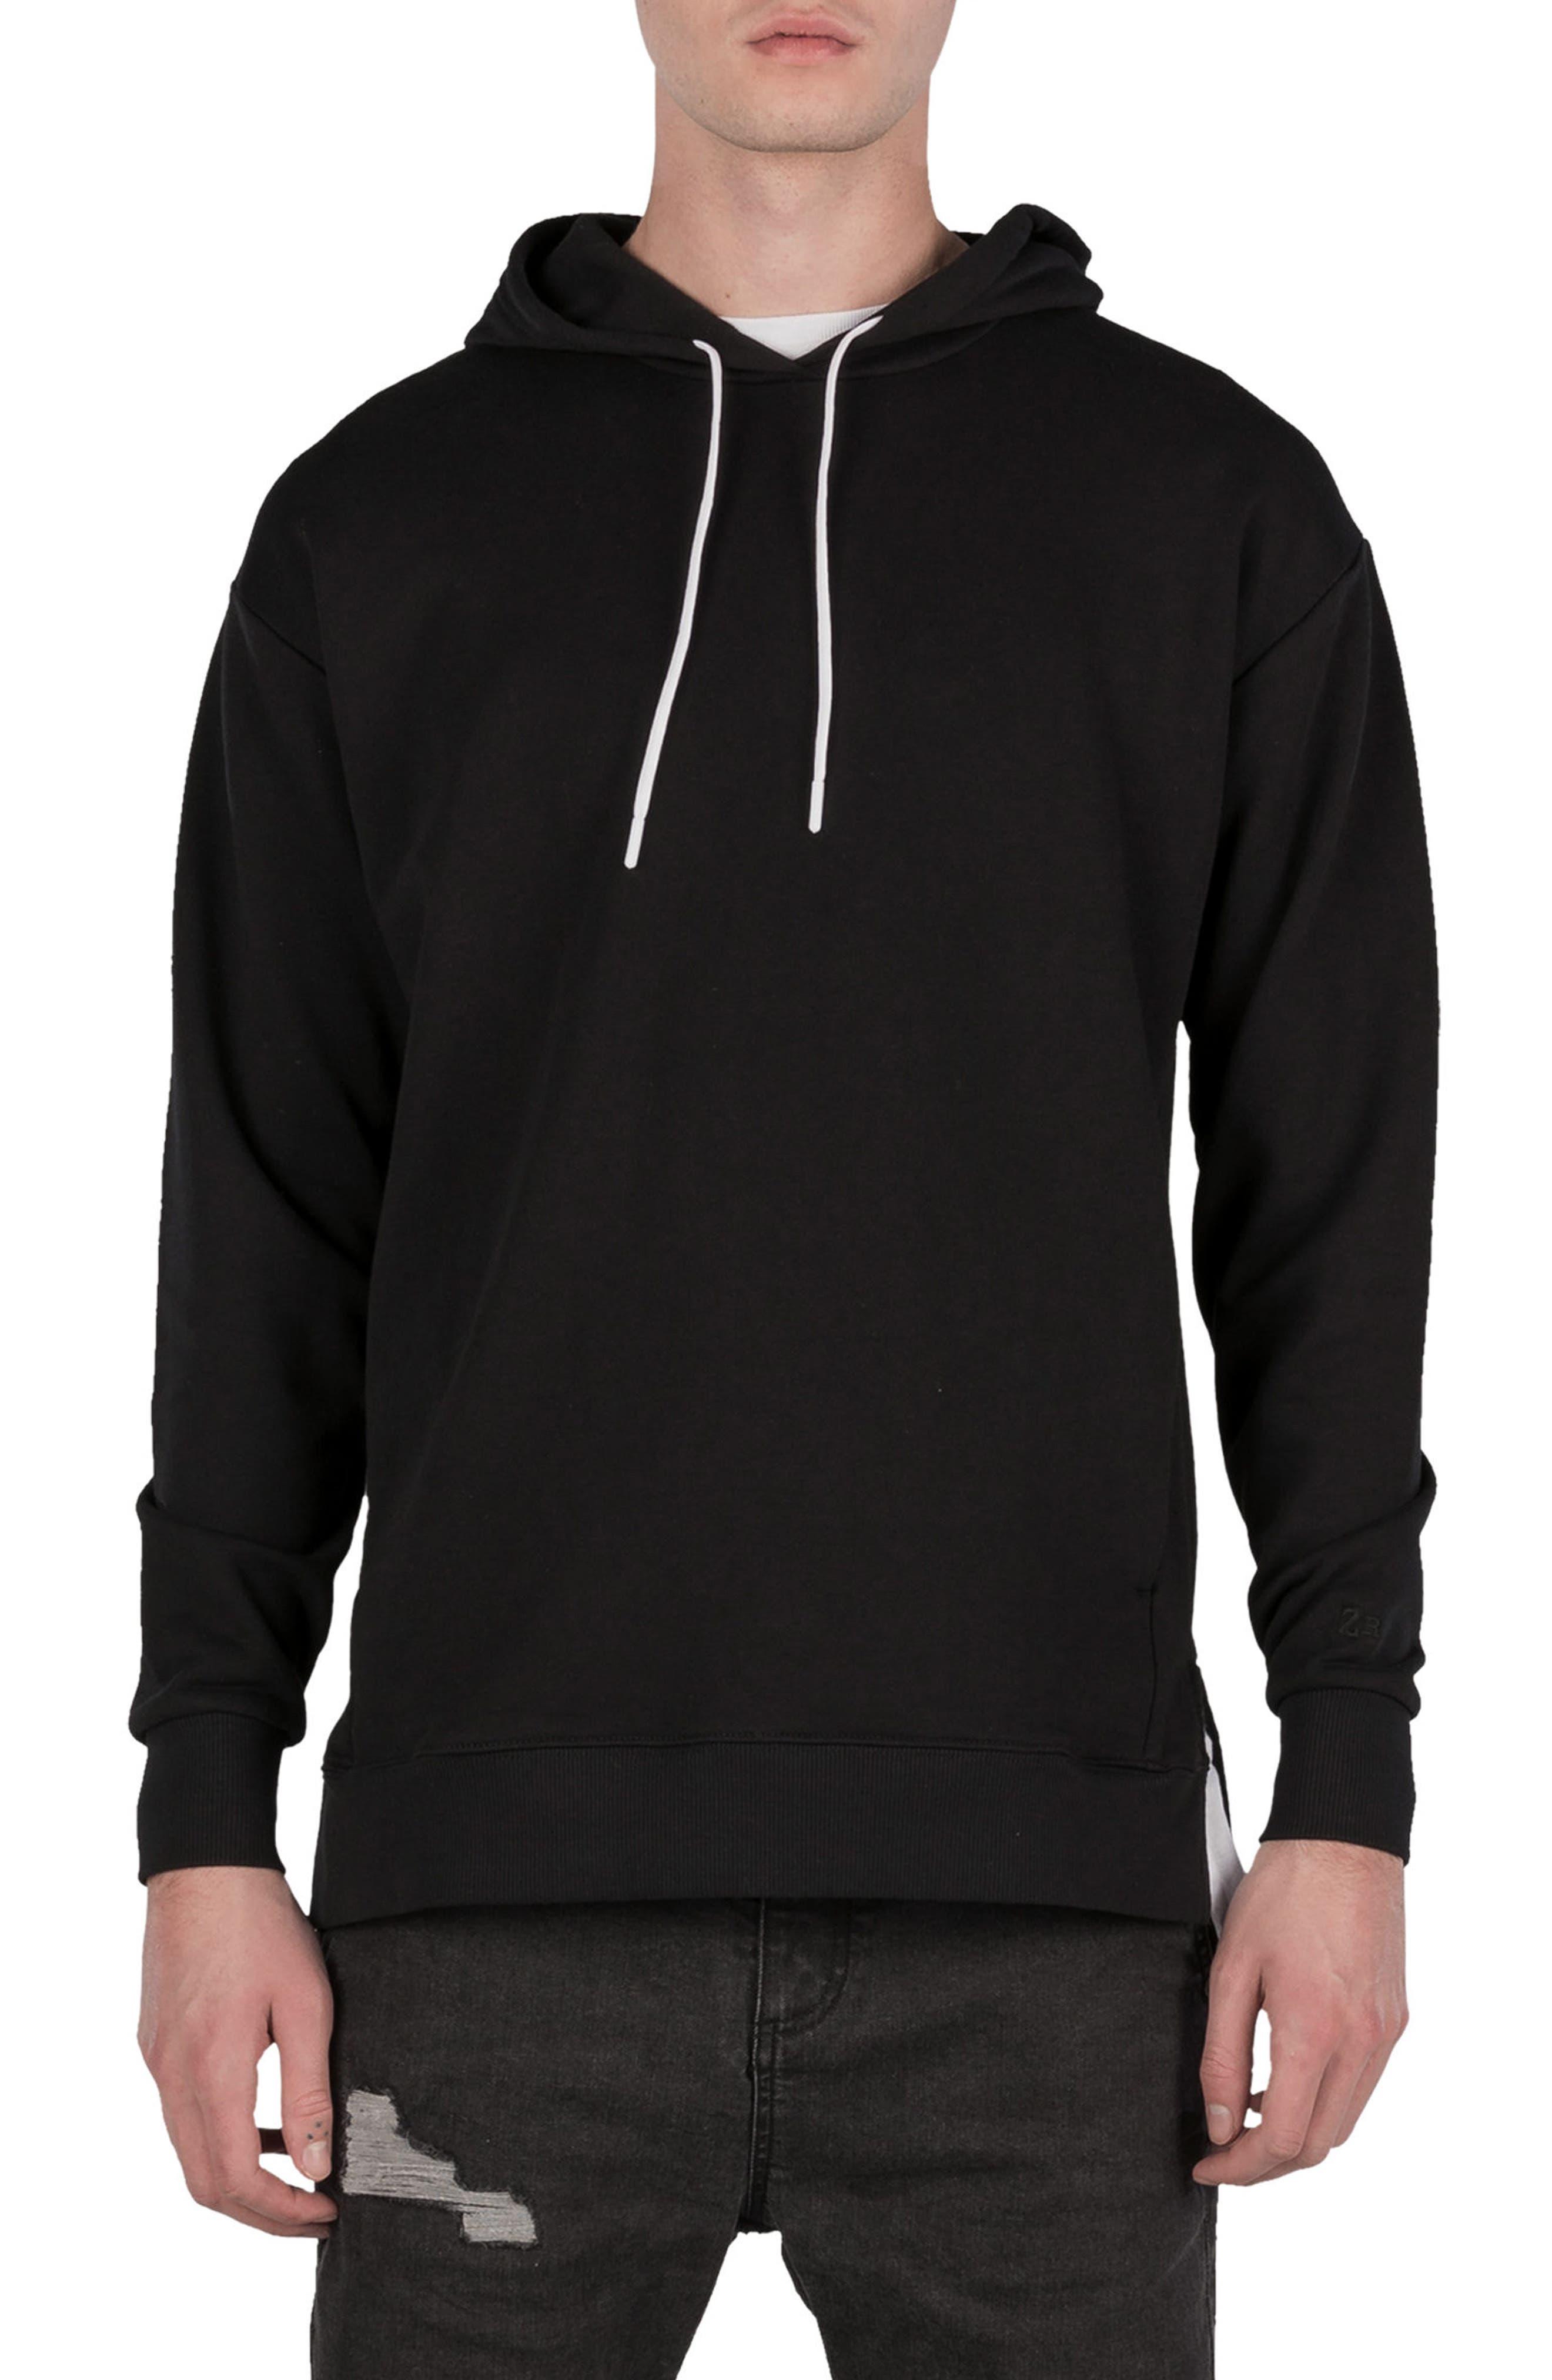 Rugger Hooded Sweatshirt,                         Main,                         color, BLACK